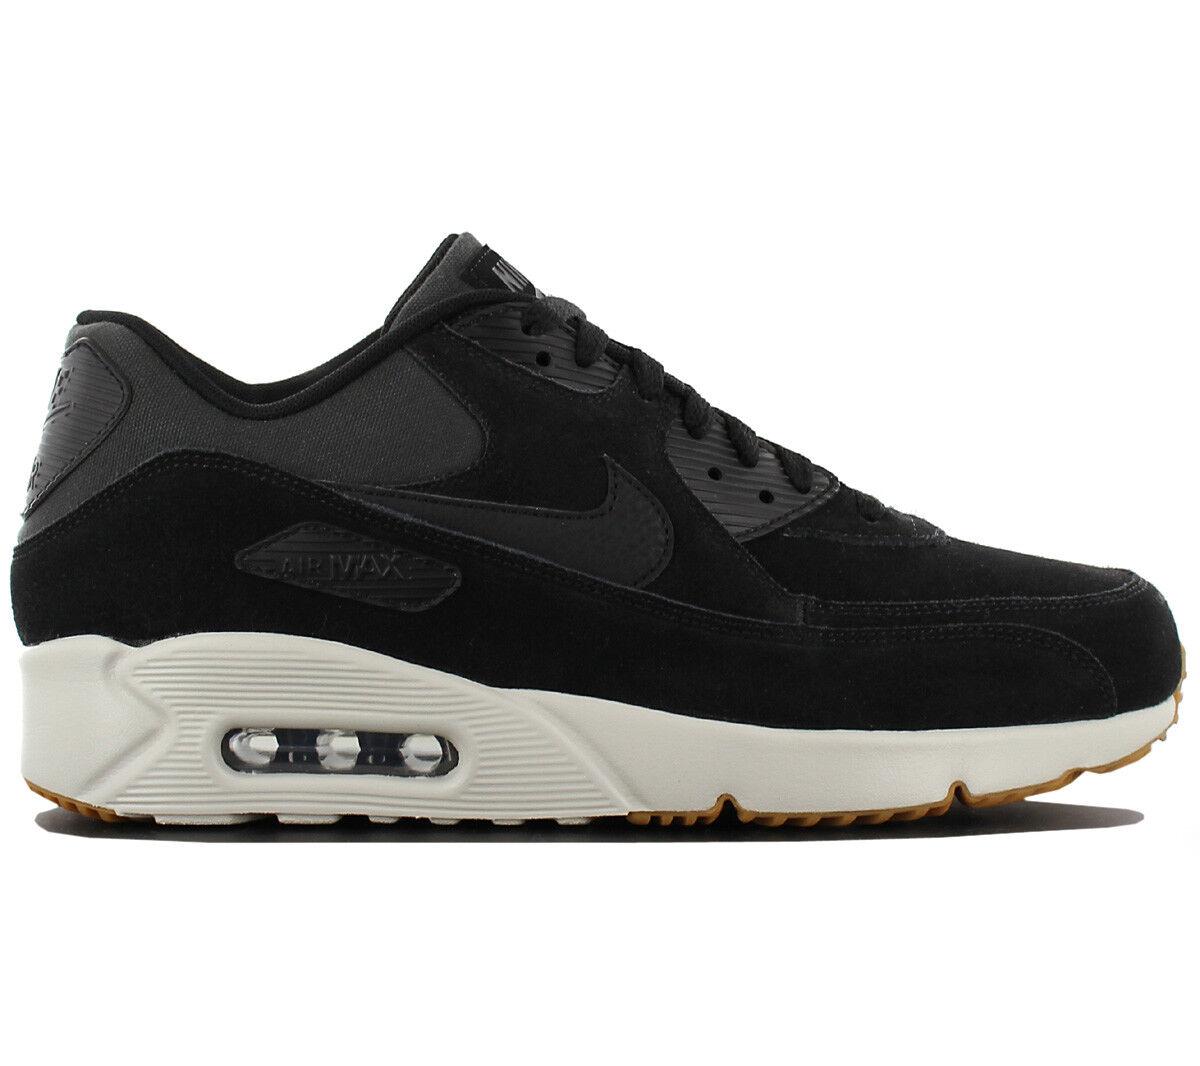 Nike Air Max 90 90 90 Ultra 2.0 Leather Ltr scarpe da ginnastica Scarpe Uomo pelle 924447-003 0e8a59